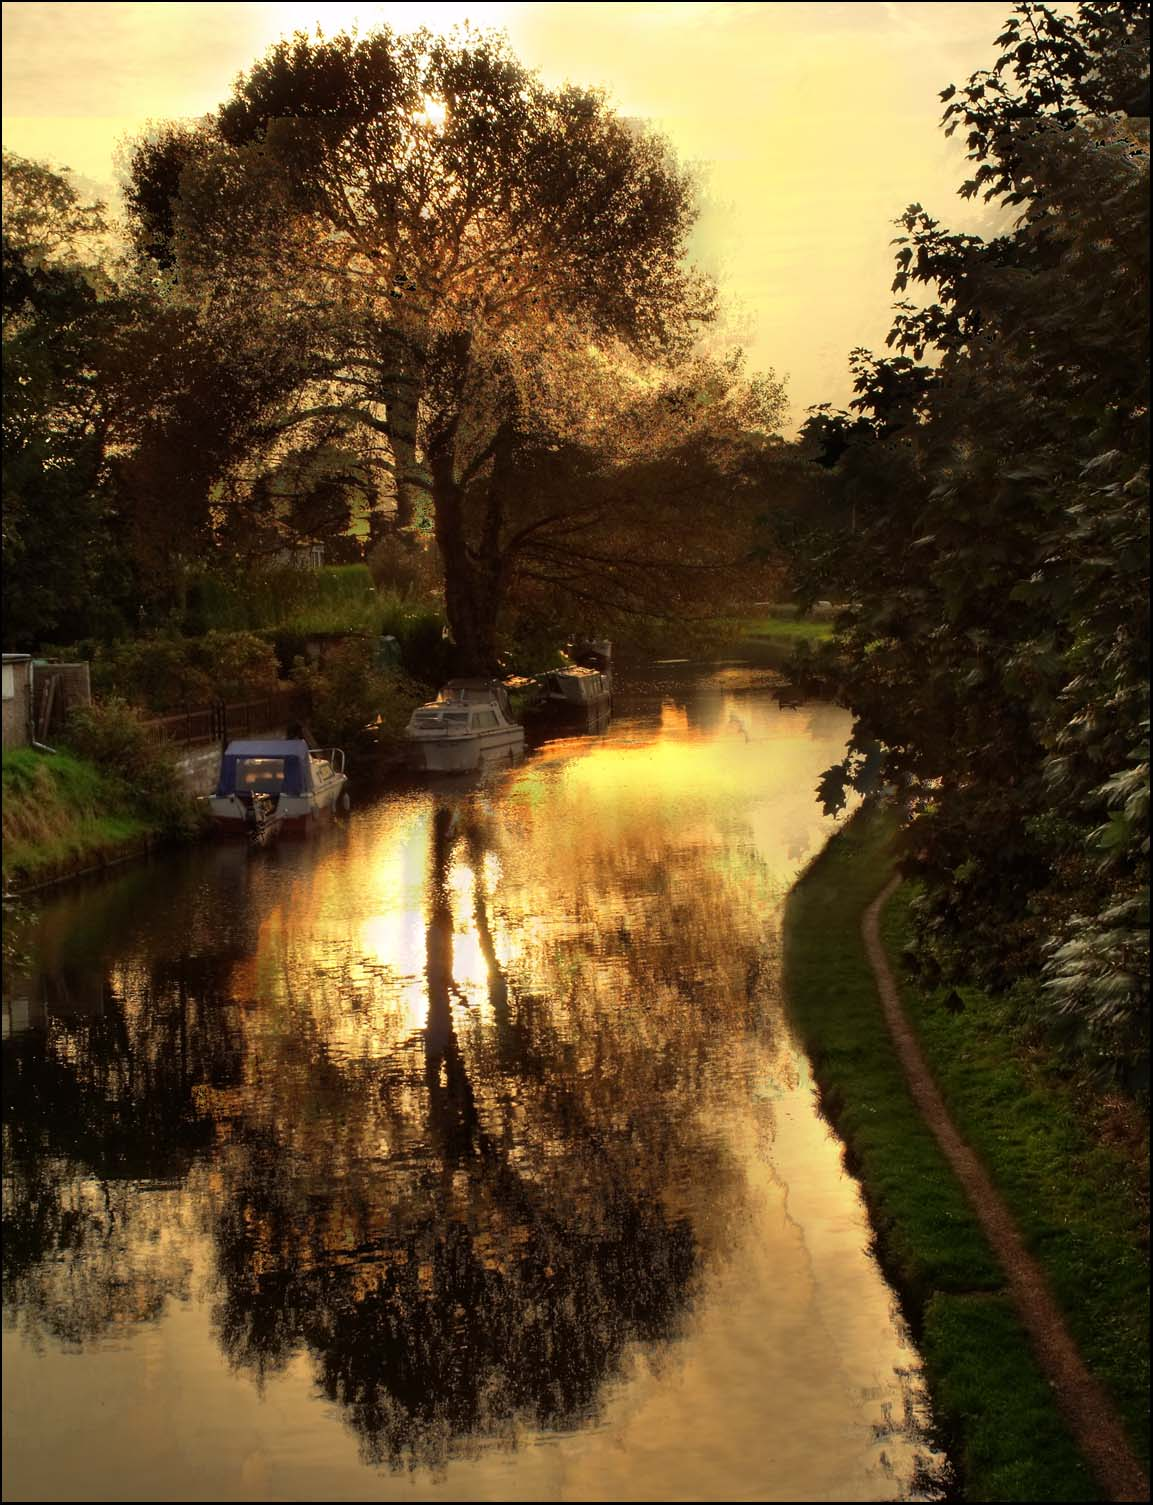 Grappenhal,Bridgewater,canal,sunset,stanney,lunt,bridge,water,tree,dusk,TDKTony,TDK,Tony,Smith,Hotpix,HotpixUK,hotpix.freeserve.co.uk,sun,set,Grappenhall Village,Grappenhall,Cheshire,England,UK,village,Warrington,A50,A56,365days,HDR,high dynamic range,tonysmith,hotpics,hotpic,hotpick,hotpicks,hot,pics,pix,picks,noche,nuit